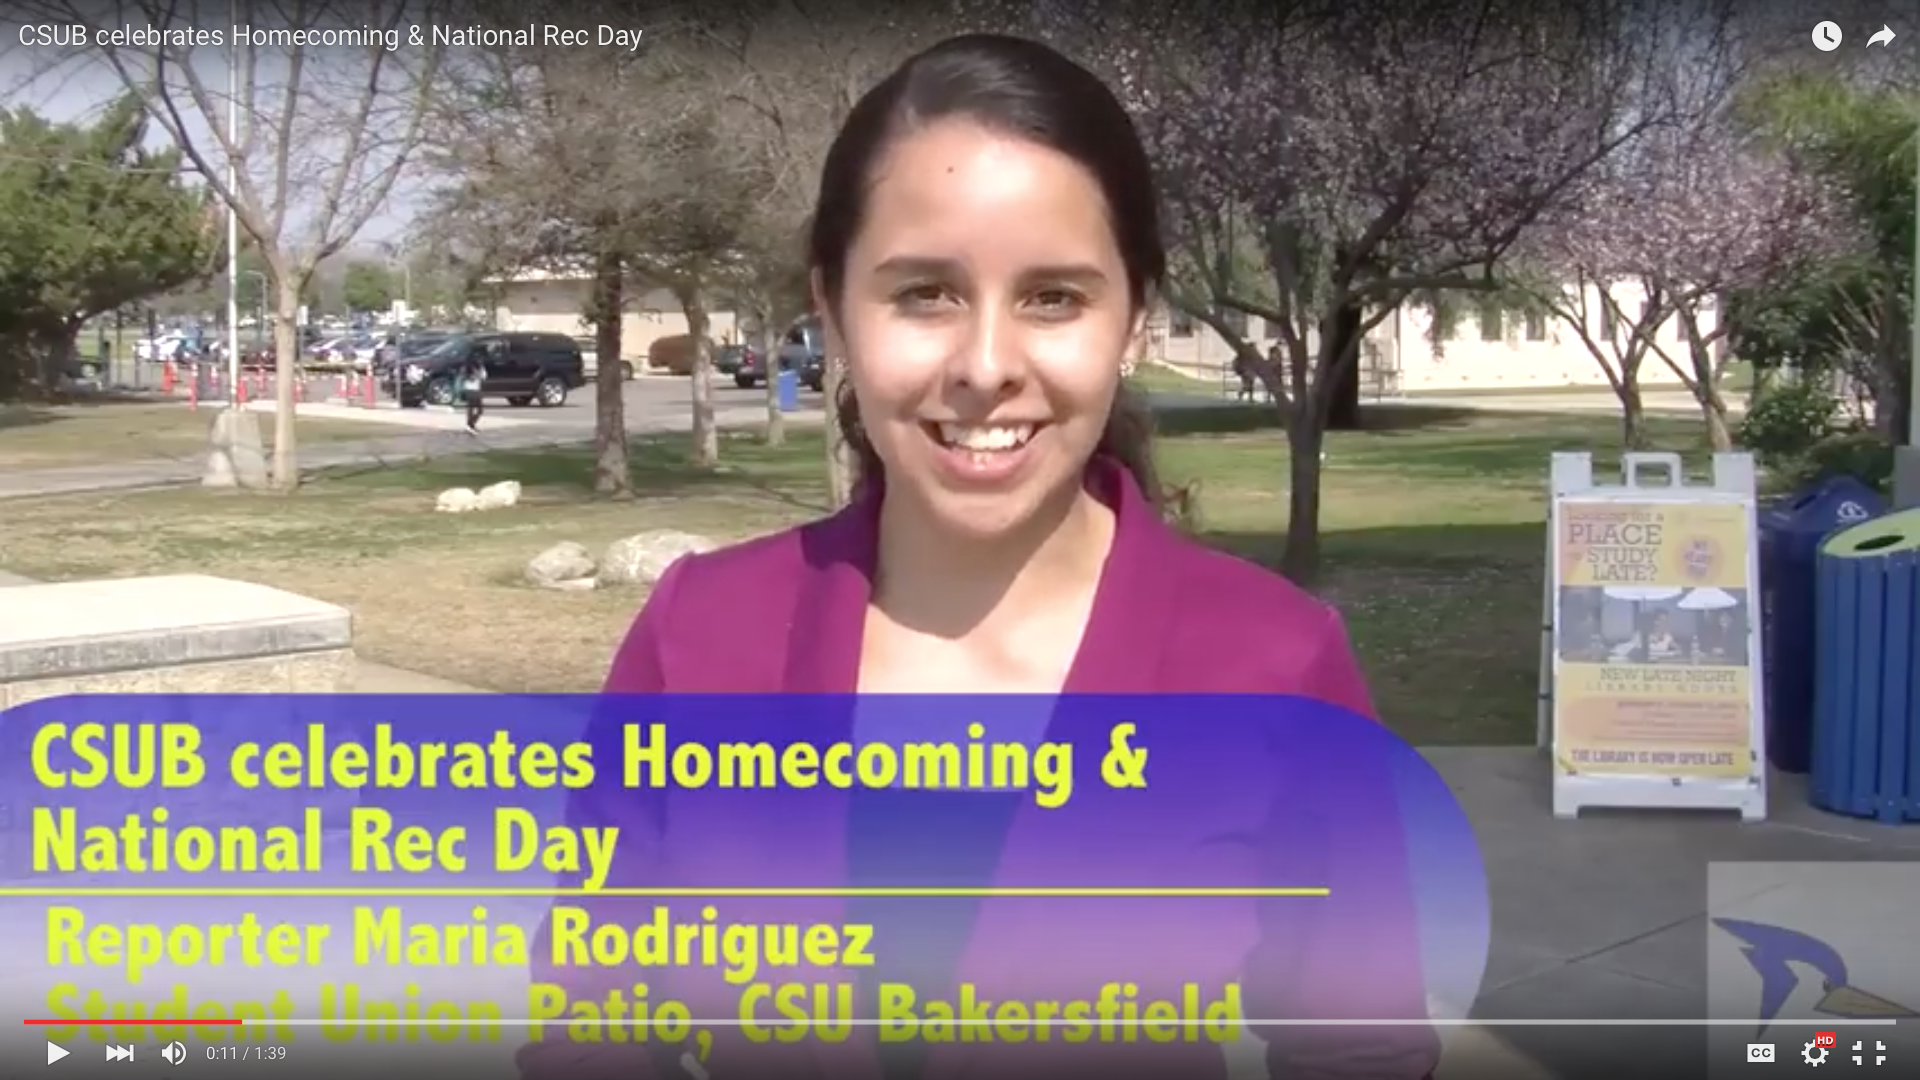 CSUB celebrates Homecoming & National Rec Day